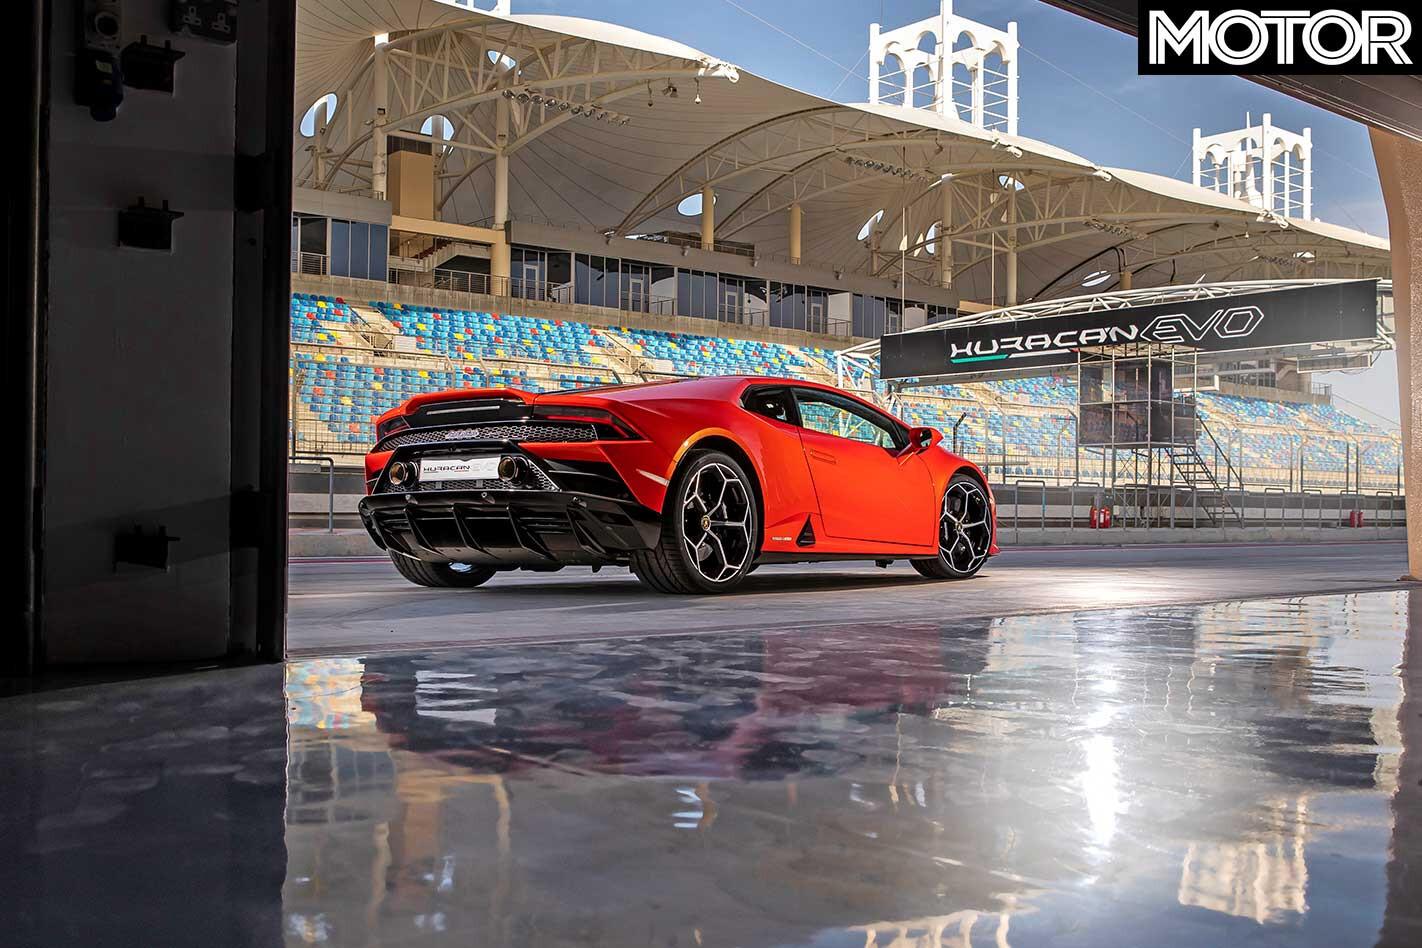 2019 Lamborghini Huracan Evo Rear Static Jpg